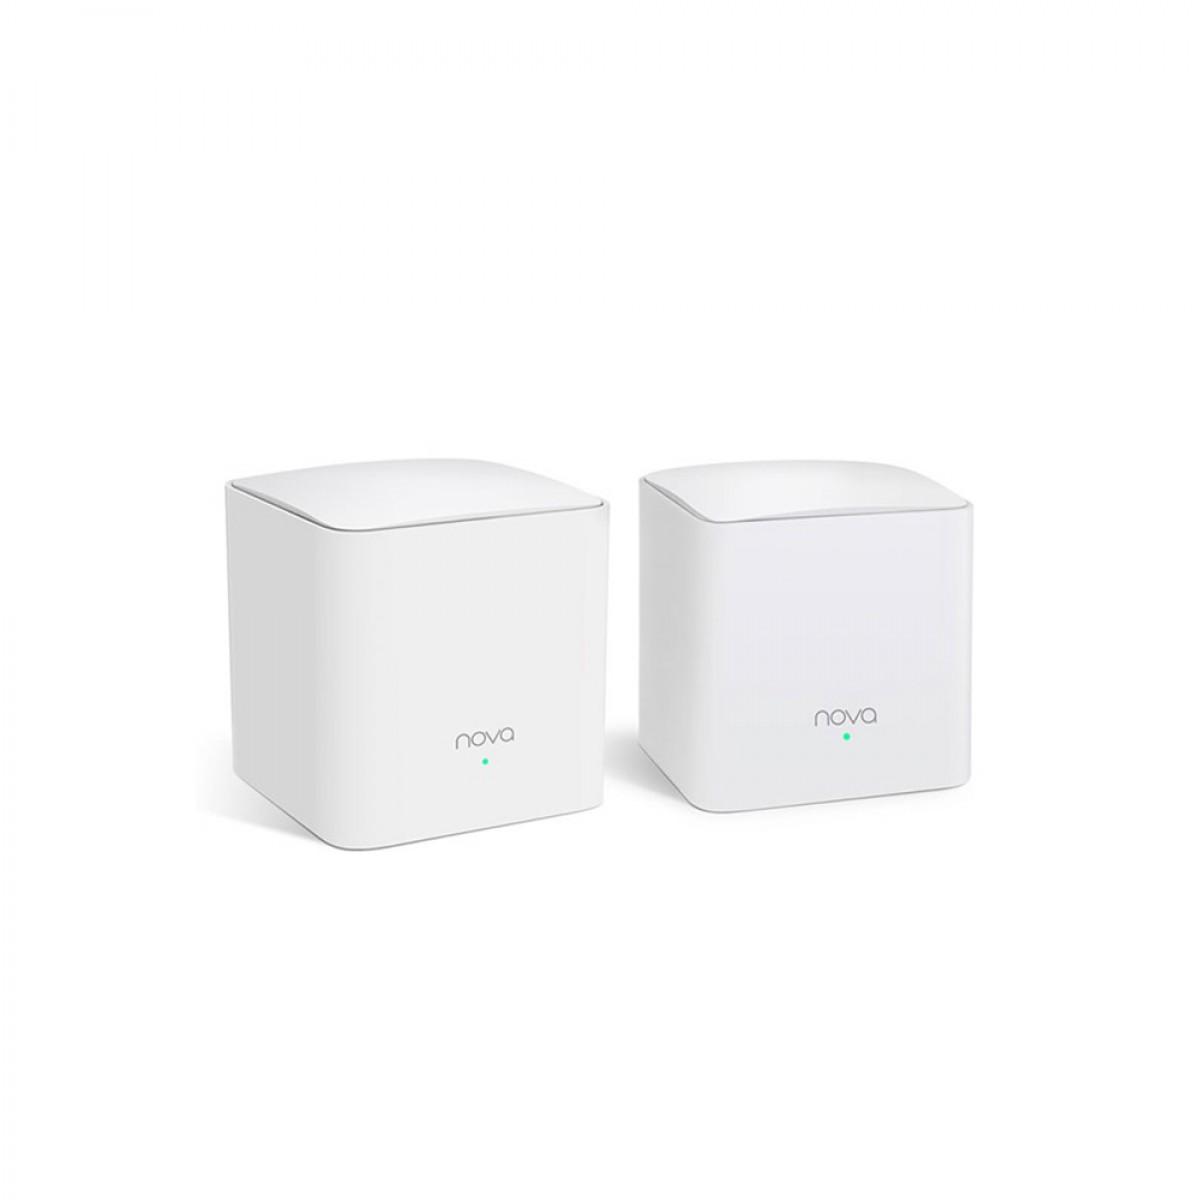 Tenda MW5C(2-PACK) AC1200 Whole Home Mesh WiFi System - VEVE